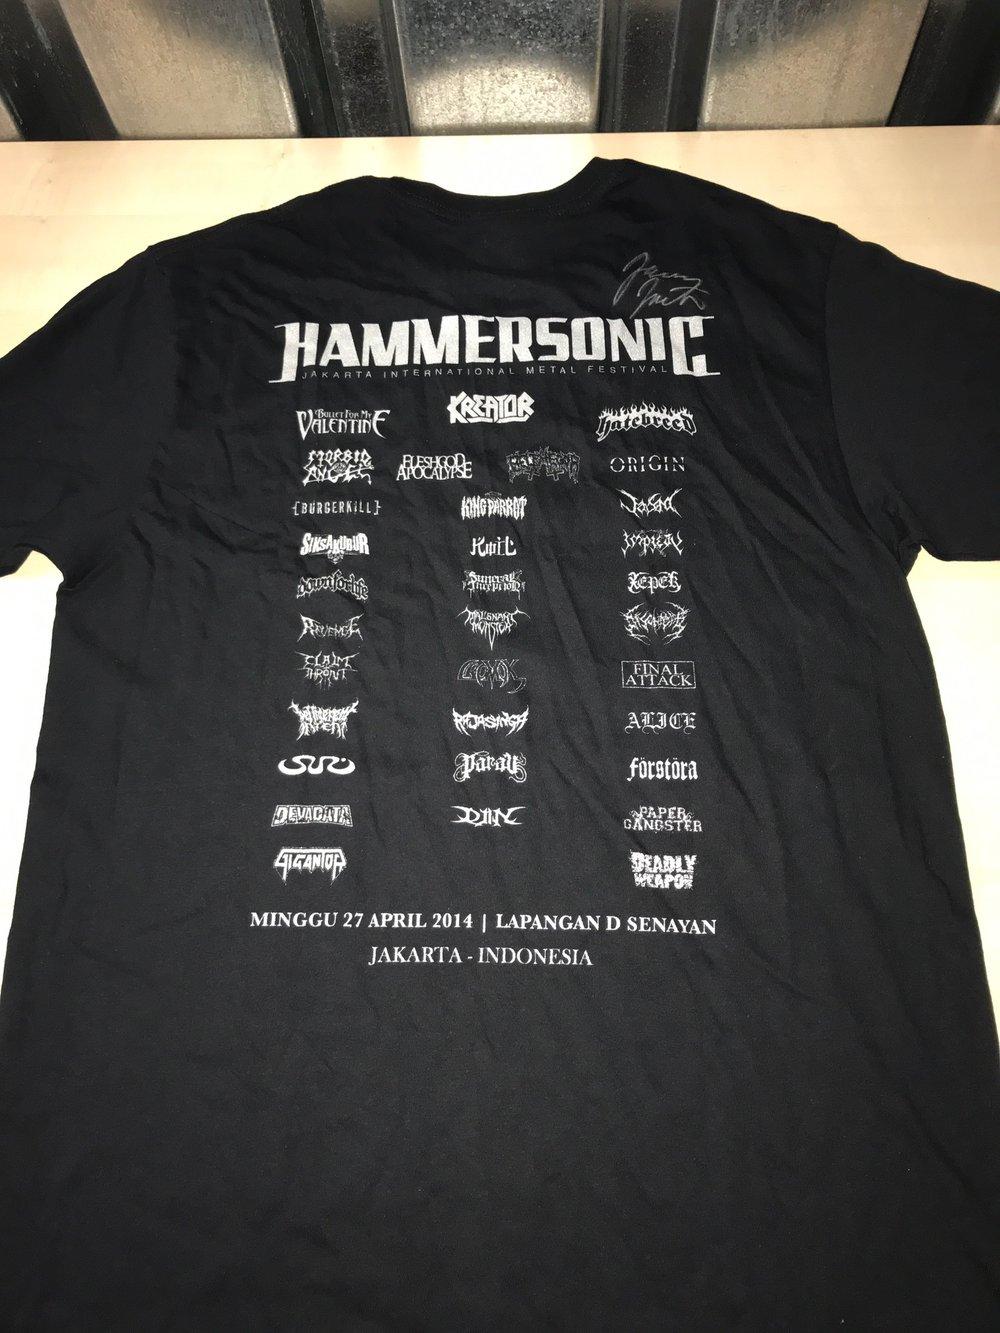 HAMMERSONIC FESTIVAL SHIRT SIZE LARGE SIGNED BY JAMEY JASTA